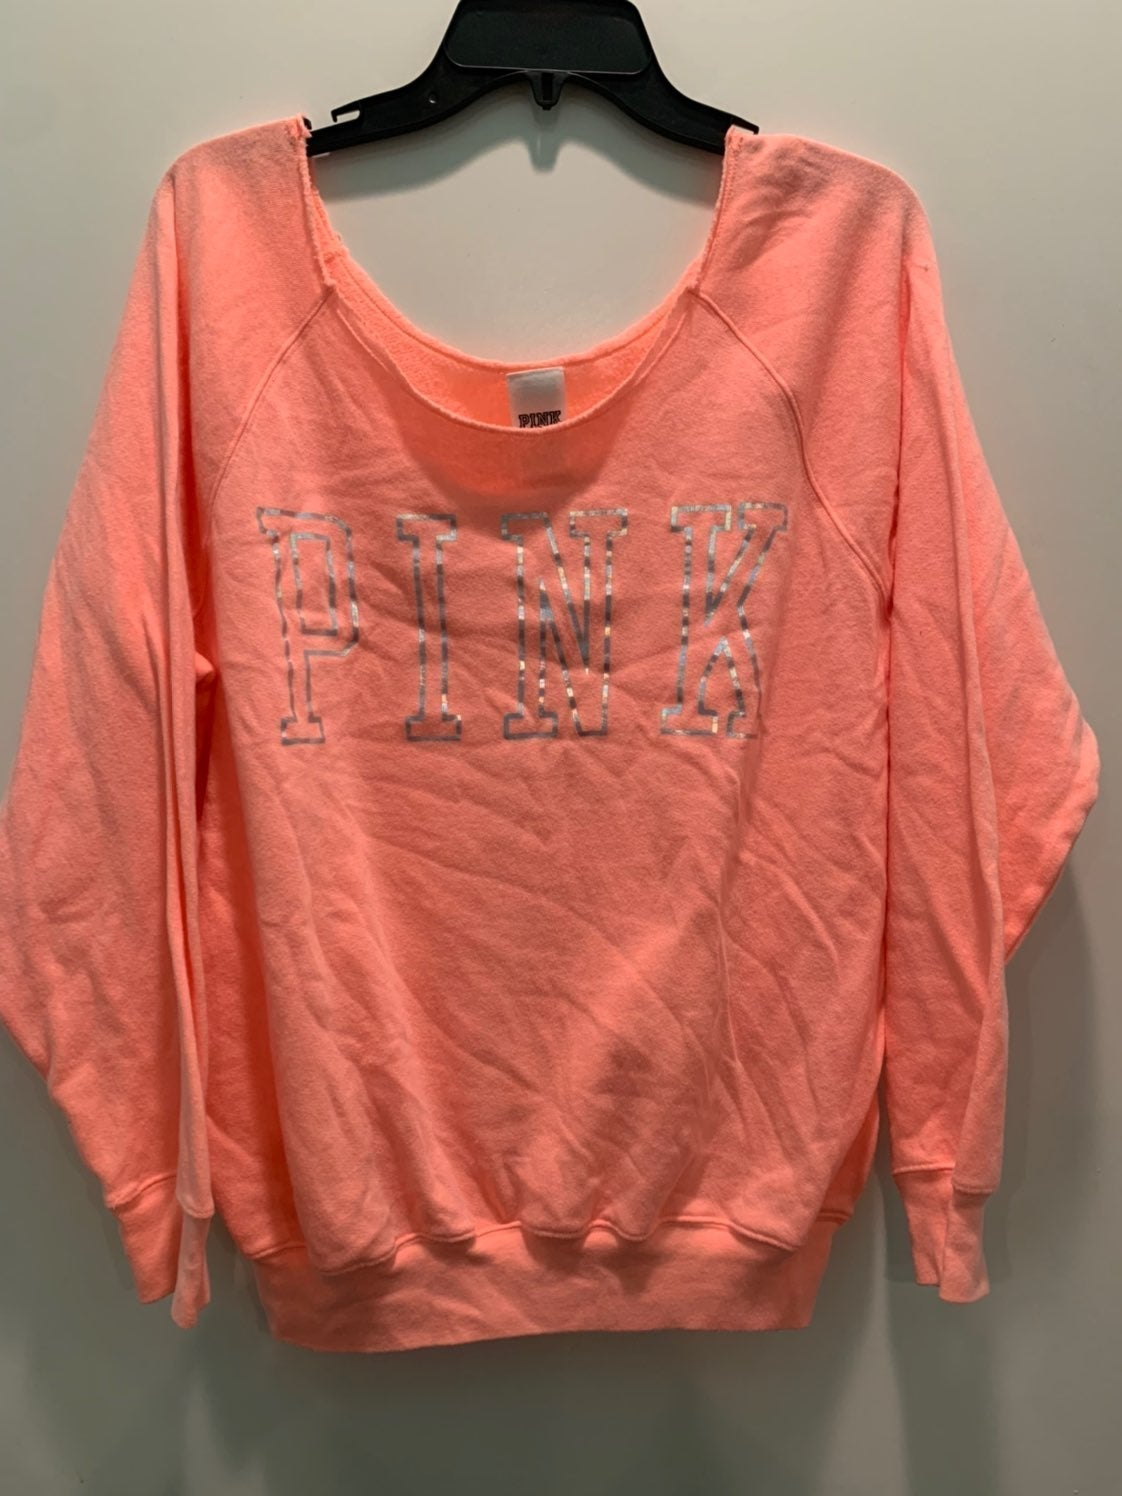 victoria secret PINK sweatshirt size Med